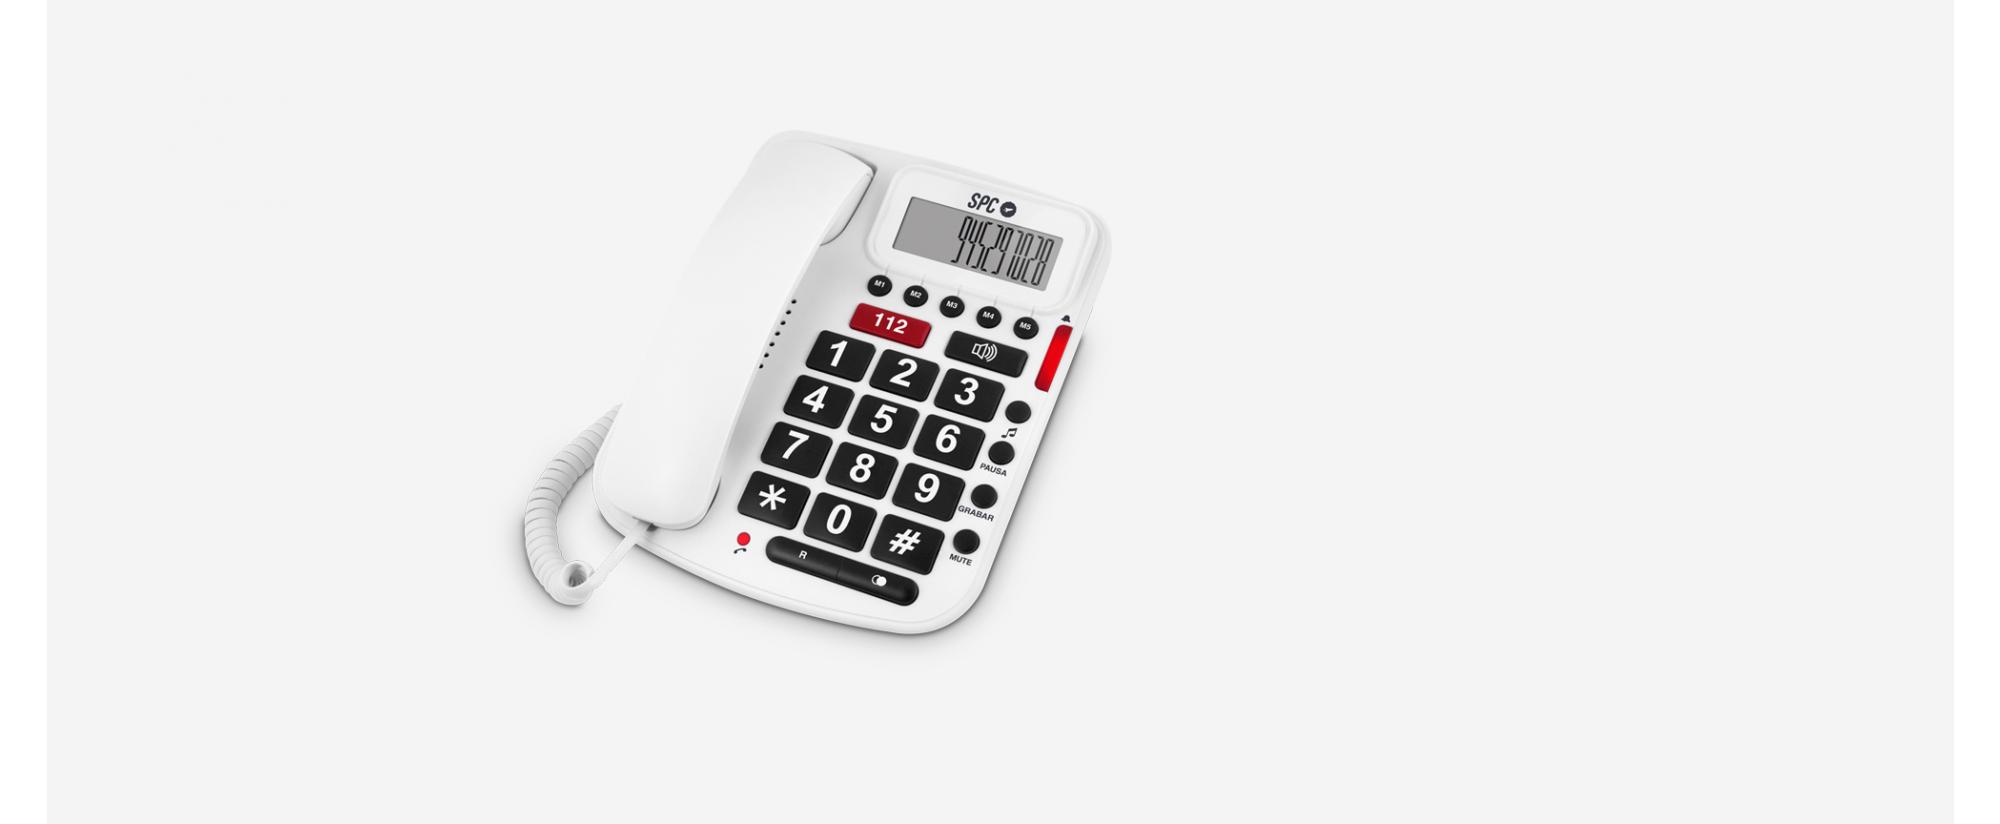 3293B - TELEFONO SPC 3293B COMFORT VOLUME BLANCO